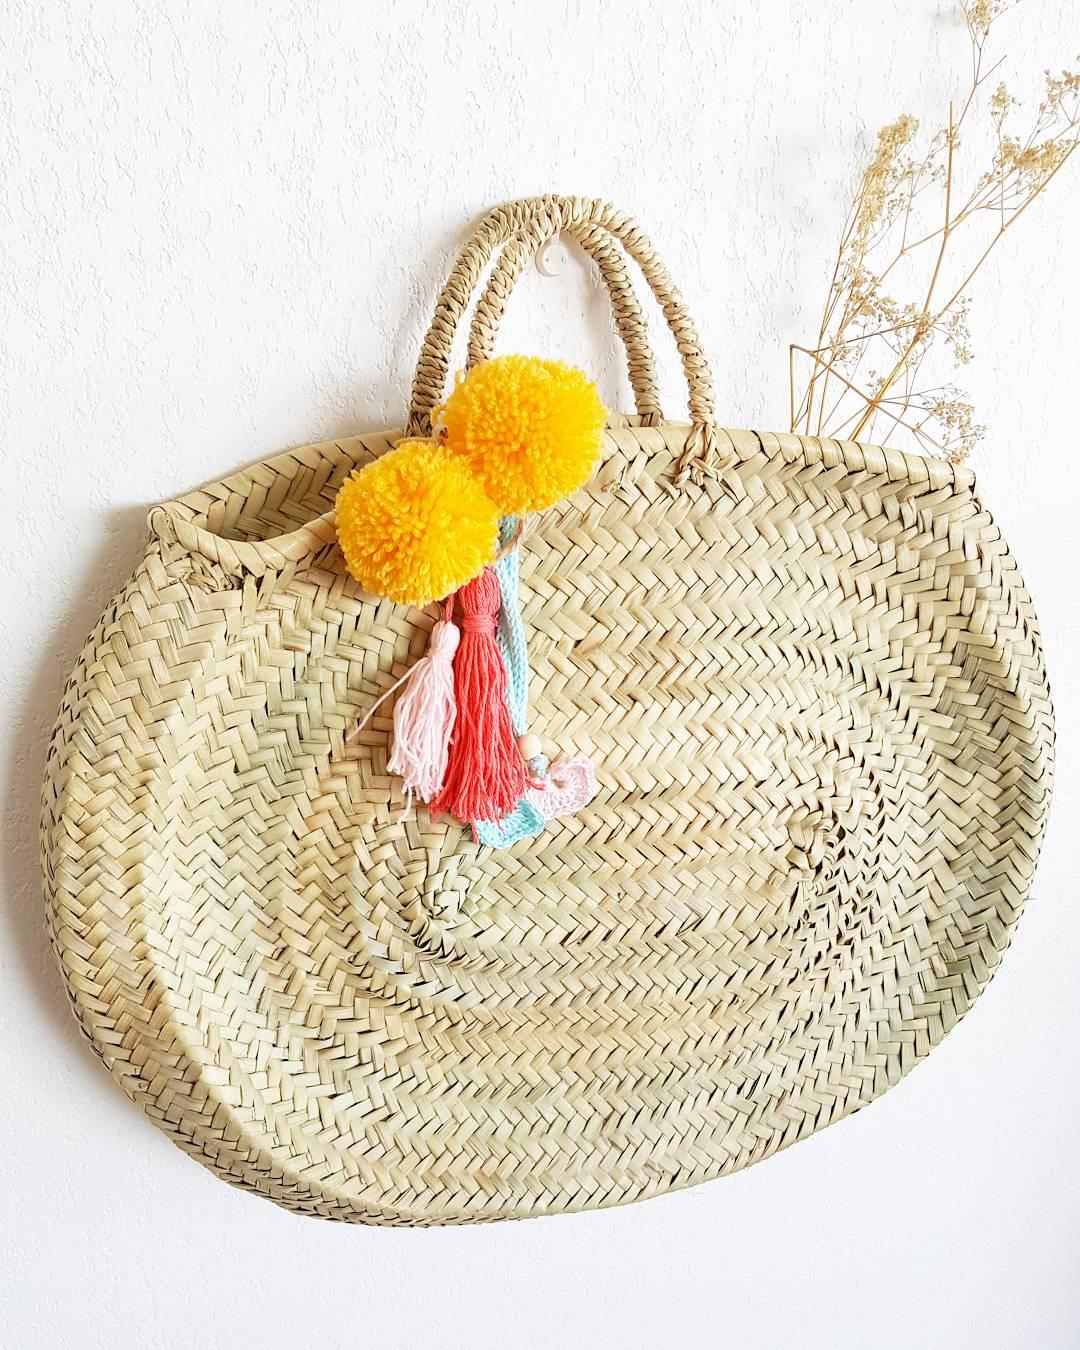 Image of Capazo Ovalado / Oval Beach Bag